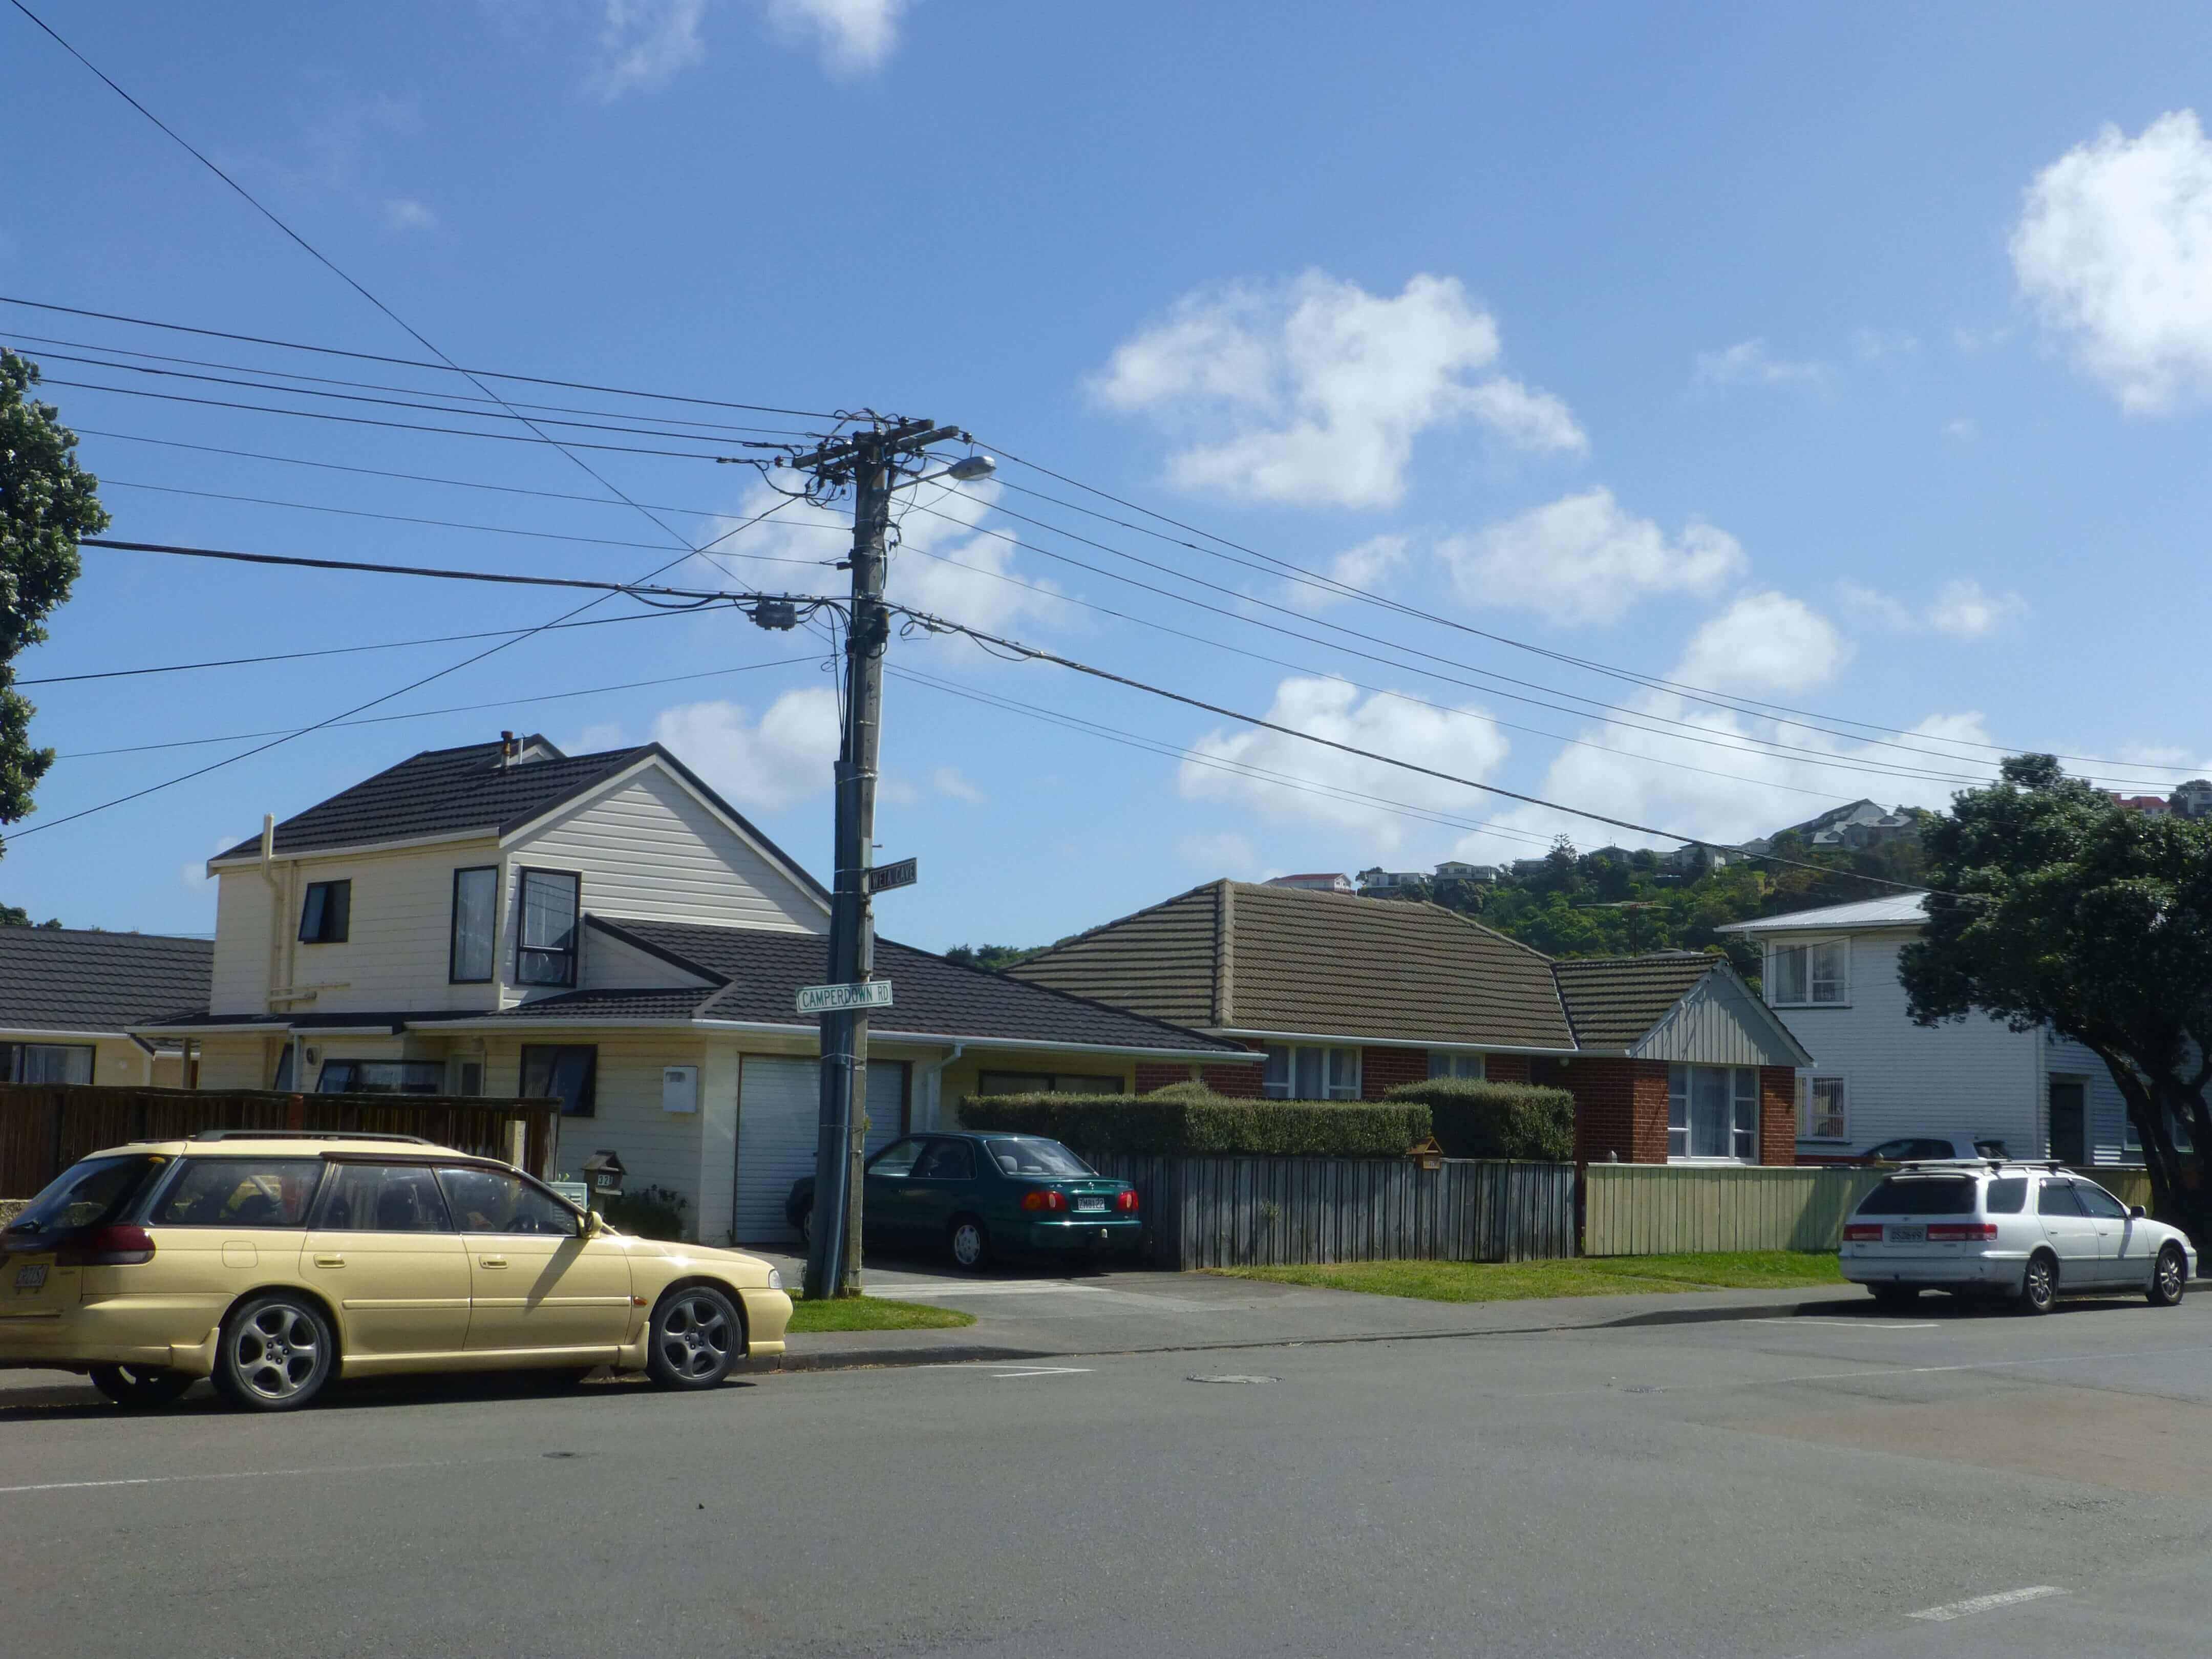 Wellington, in Miramar auf dem Weg zum Weta Shop, Weit-weg.reisen 4